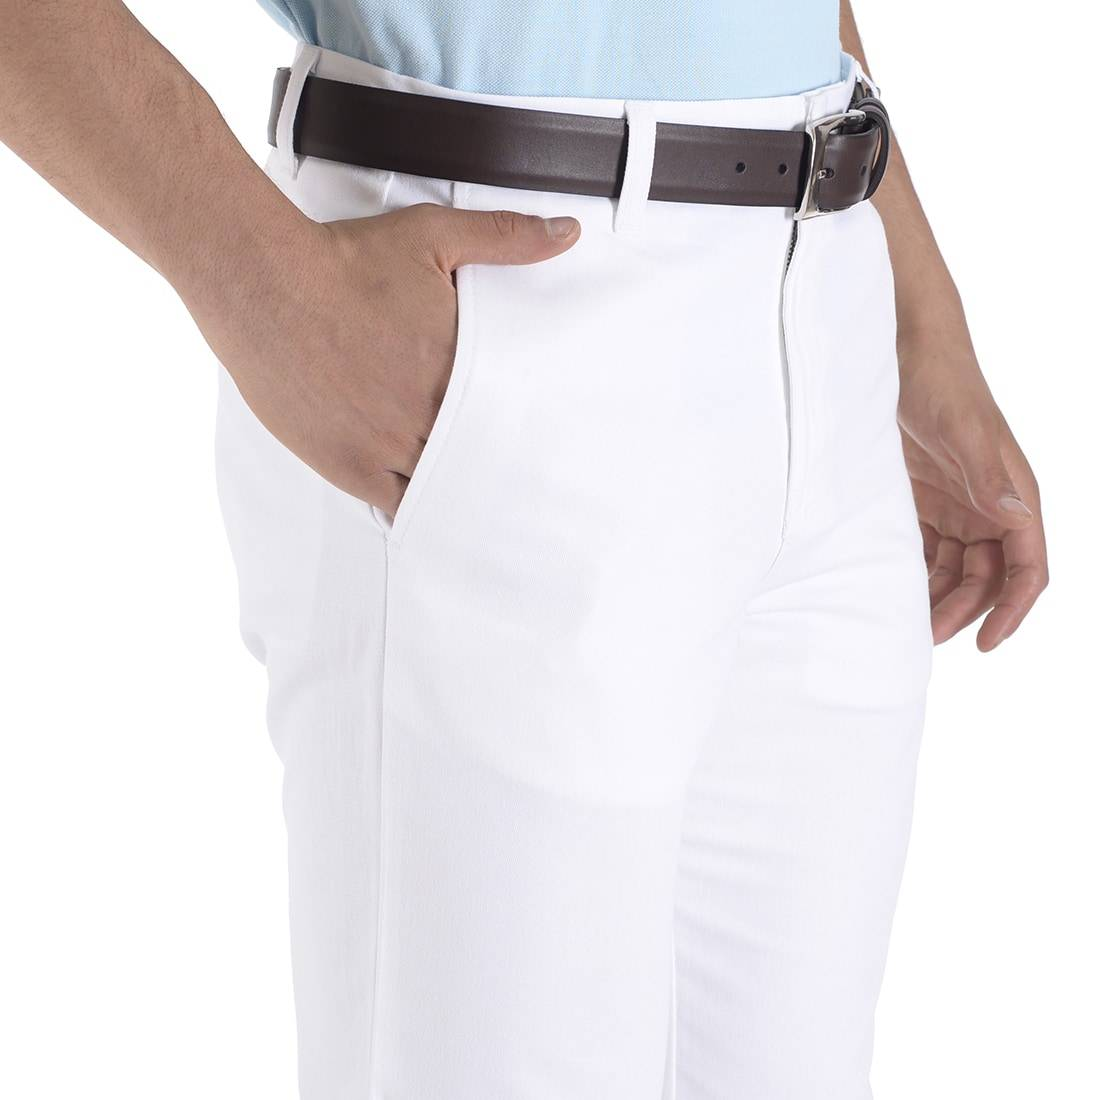 010789055202-03-Pantalon-Casual-Classic-Fit-Blanco-yale